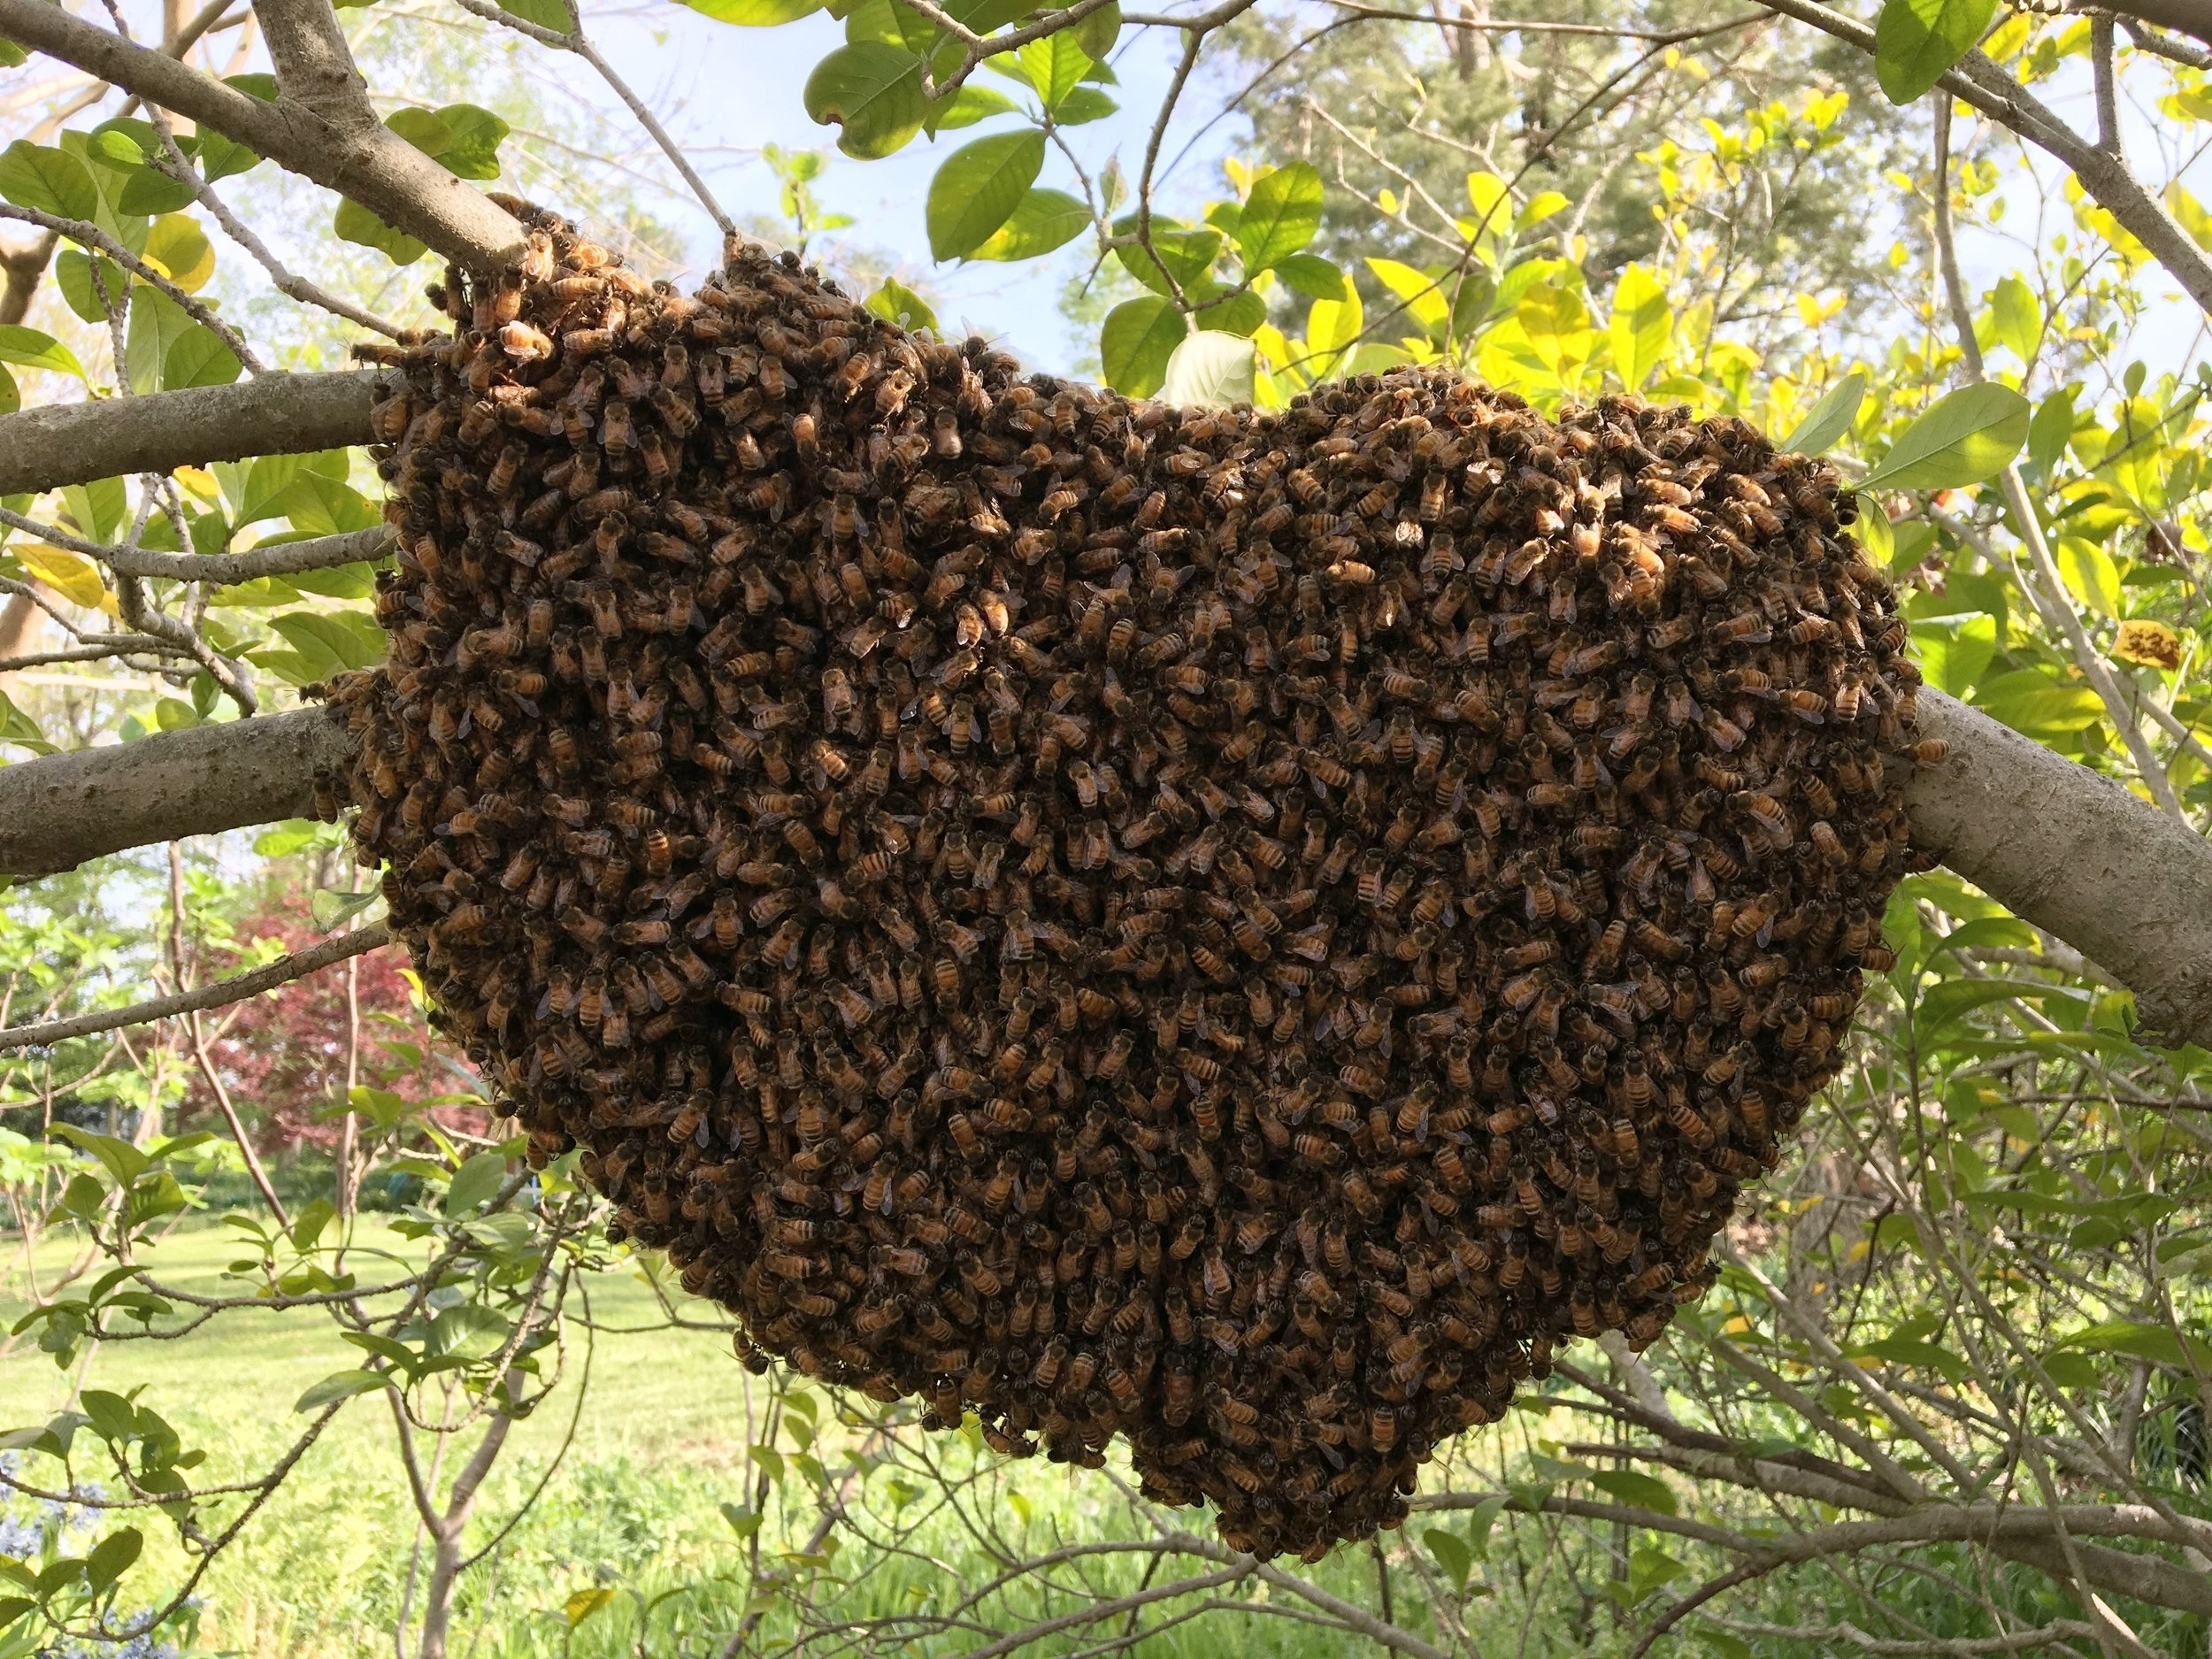 swarm3.jpg